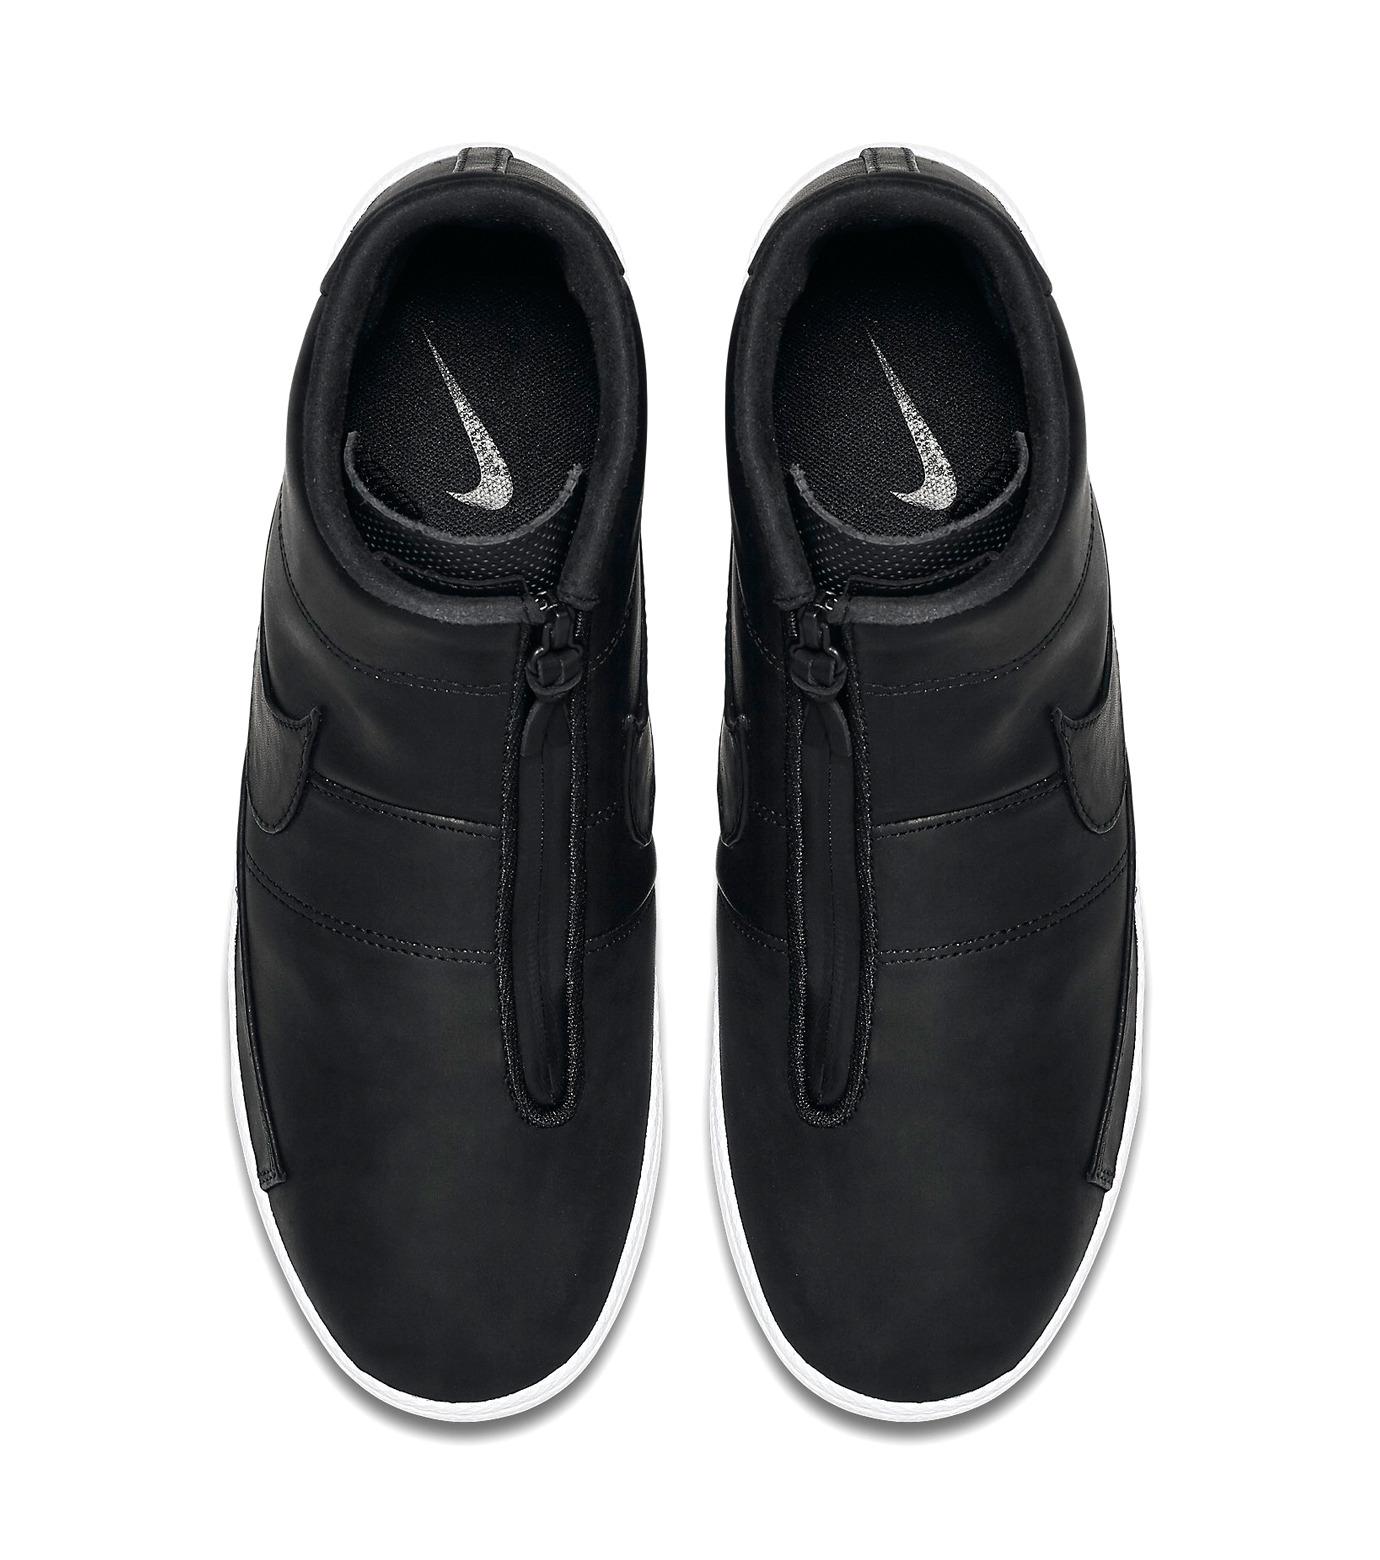 NIKE(ナイキ)のNIKELAB BLAZER ADVNCD-BLACK(シューズ/shoes)-874775-001-13 拡大詳細画像4